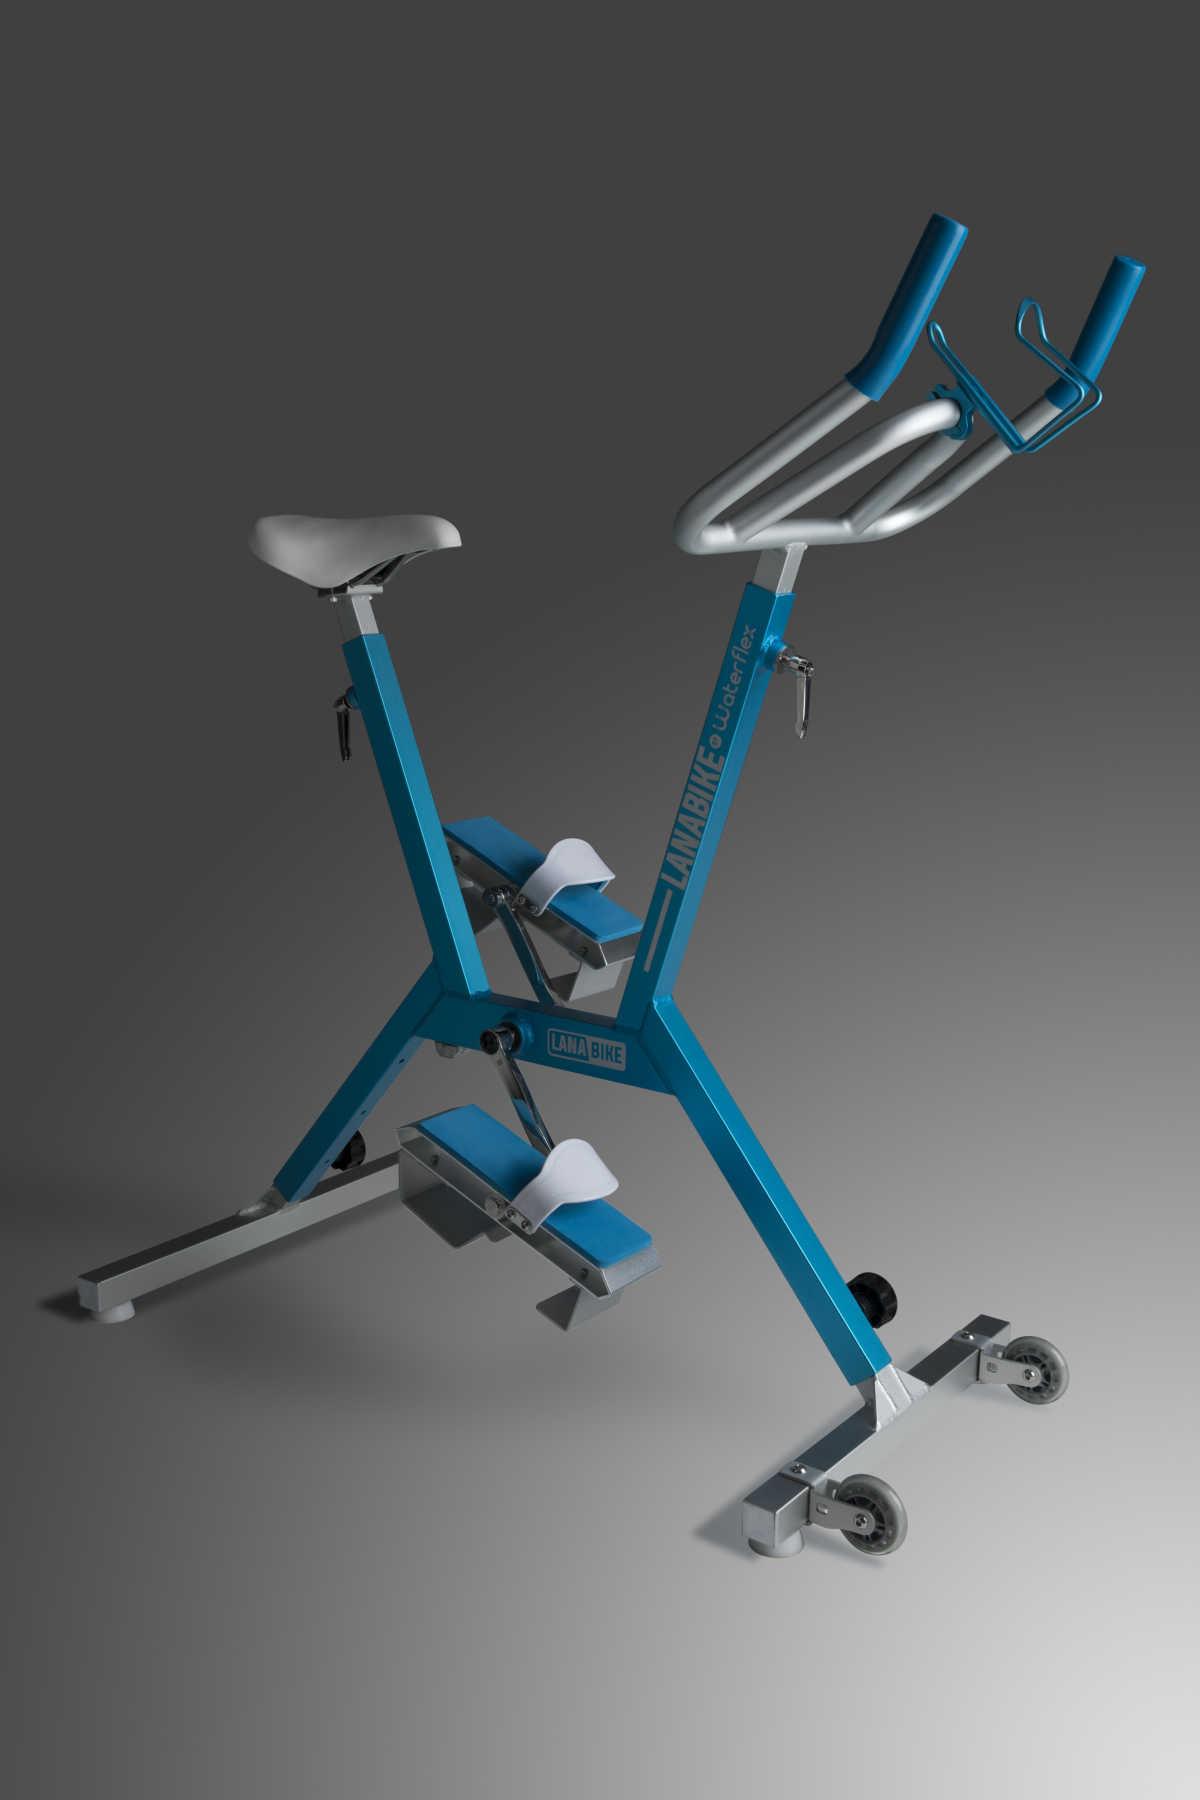 An Aqua Bike Helps You Enjoy Your Active Life